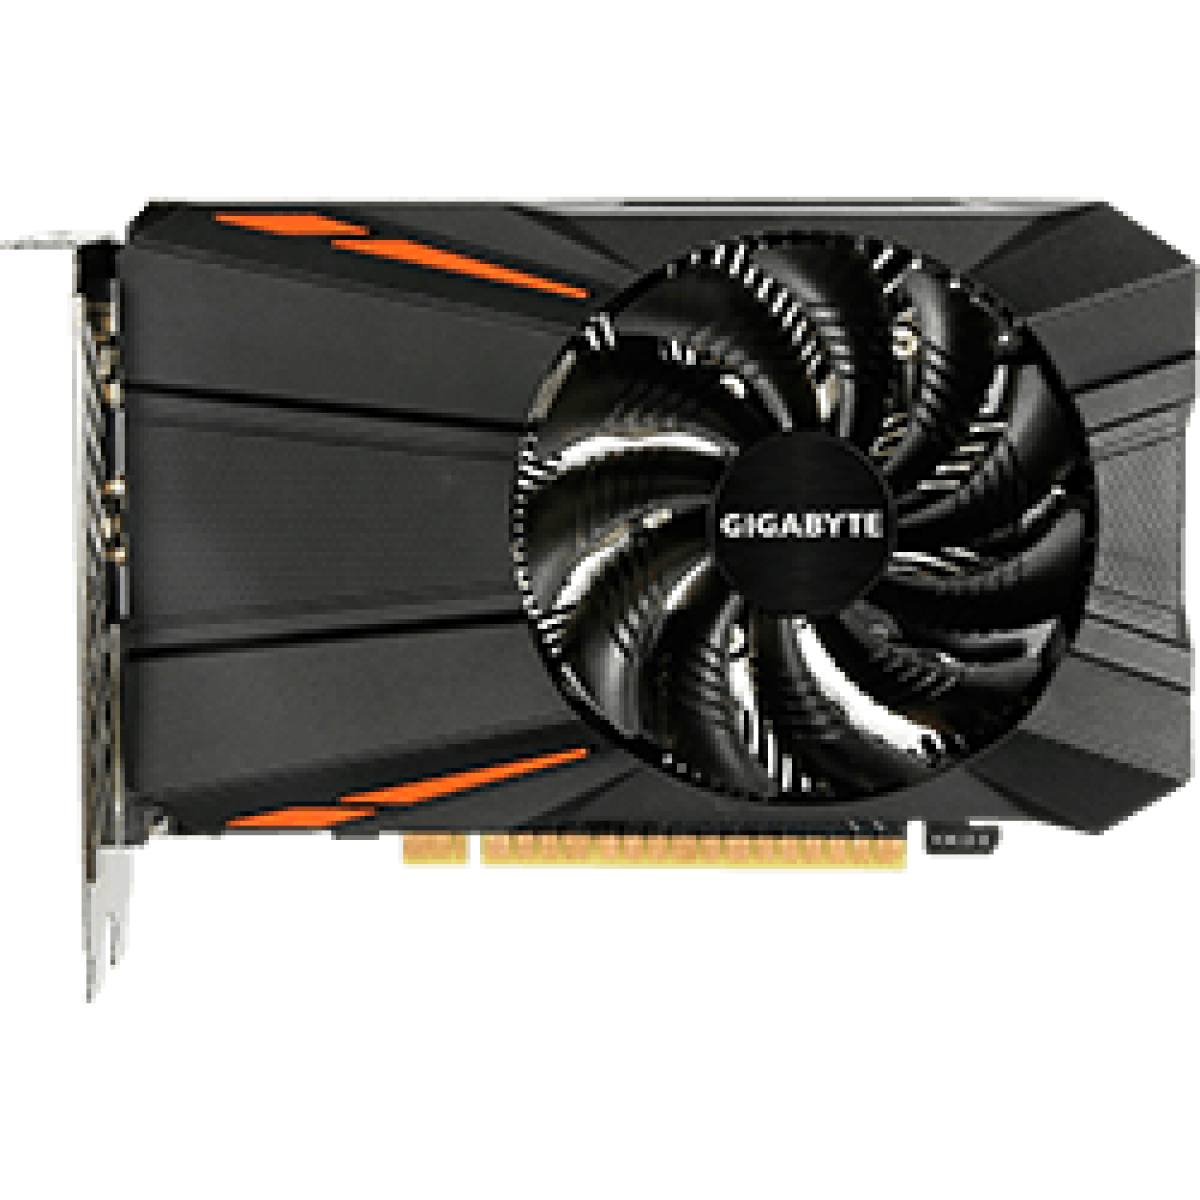 Placa de Vídeo Gigabyte GeForce GTX 1050 Ti D5, 4GB GDDR5, 128Bit